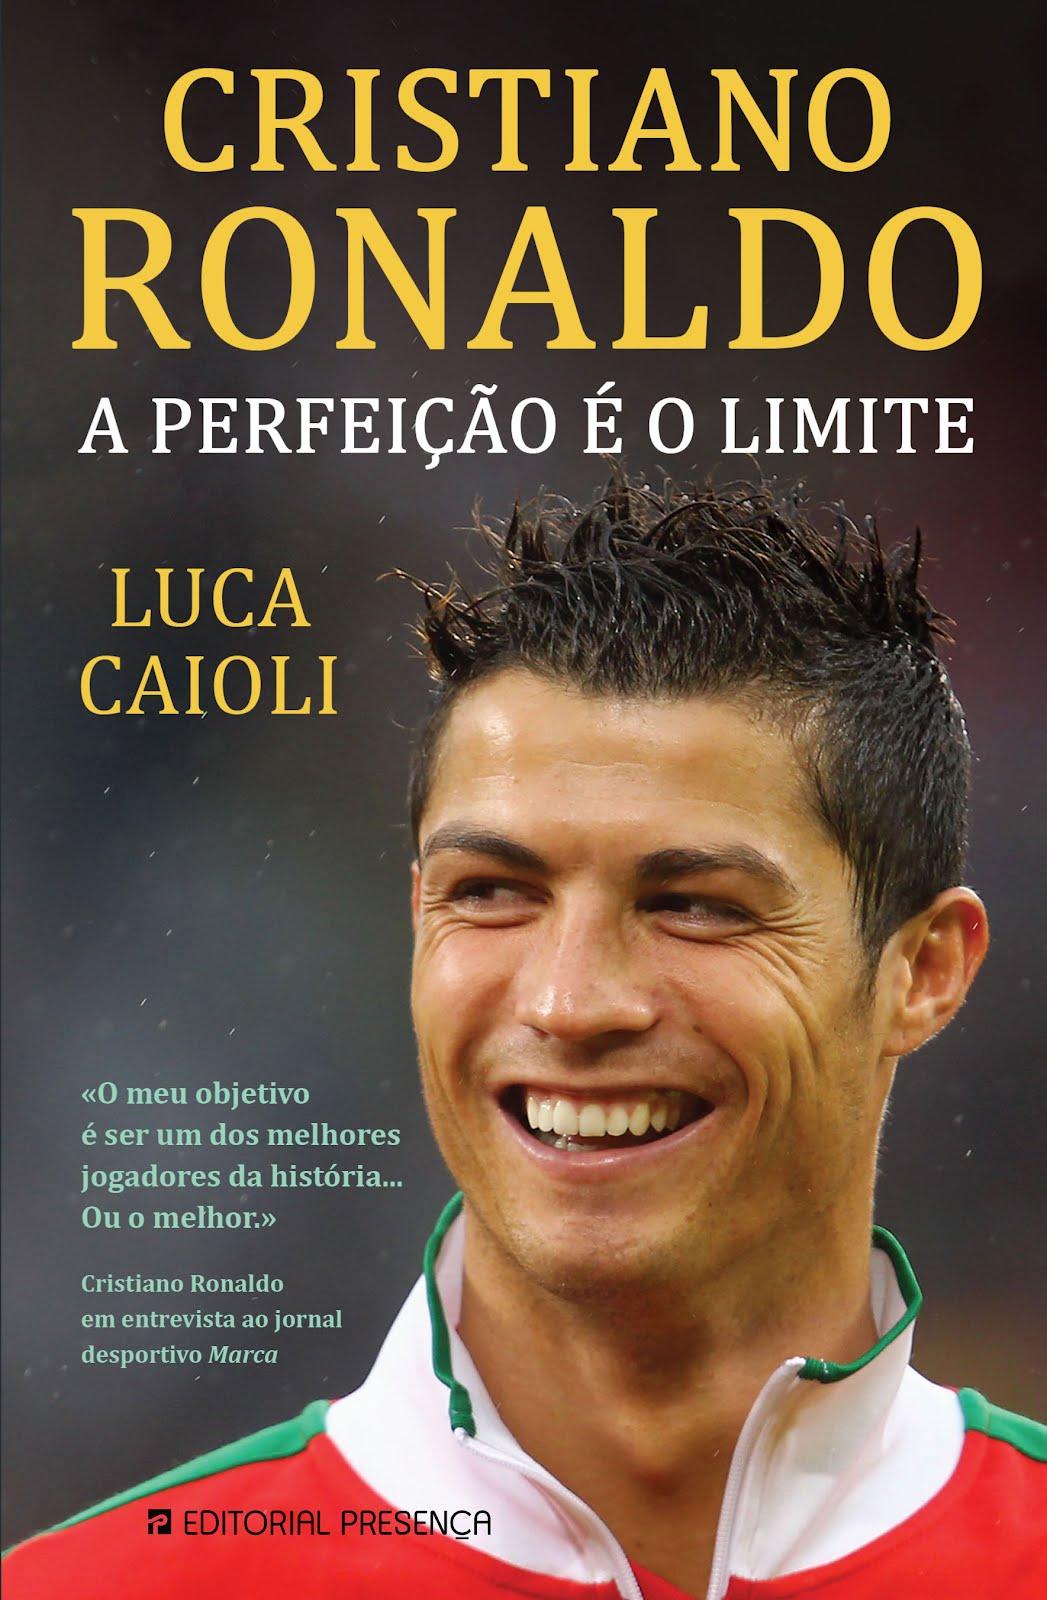 http://4.bp.blogspot.com/-kLCvZXxxugo/T8kLGHZUsdI/AAAAAAAAHTU/SLolCX9_A1E/s1600/01990060_Cristiano_Ronaldo.jpg